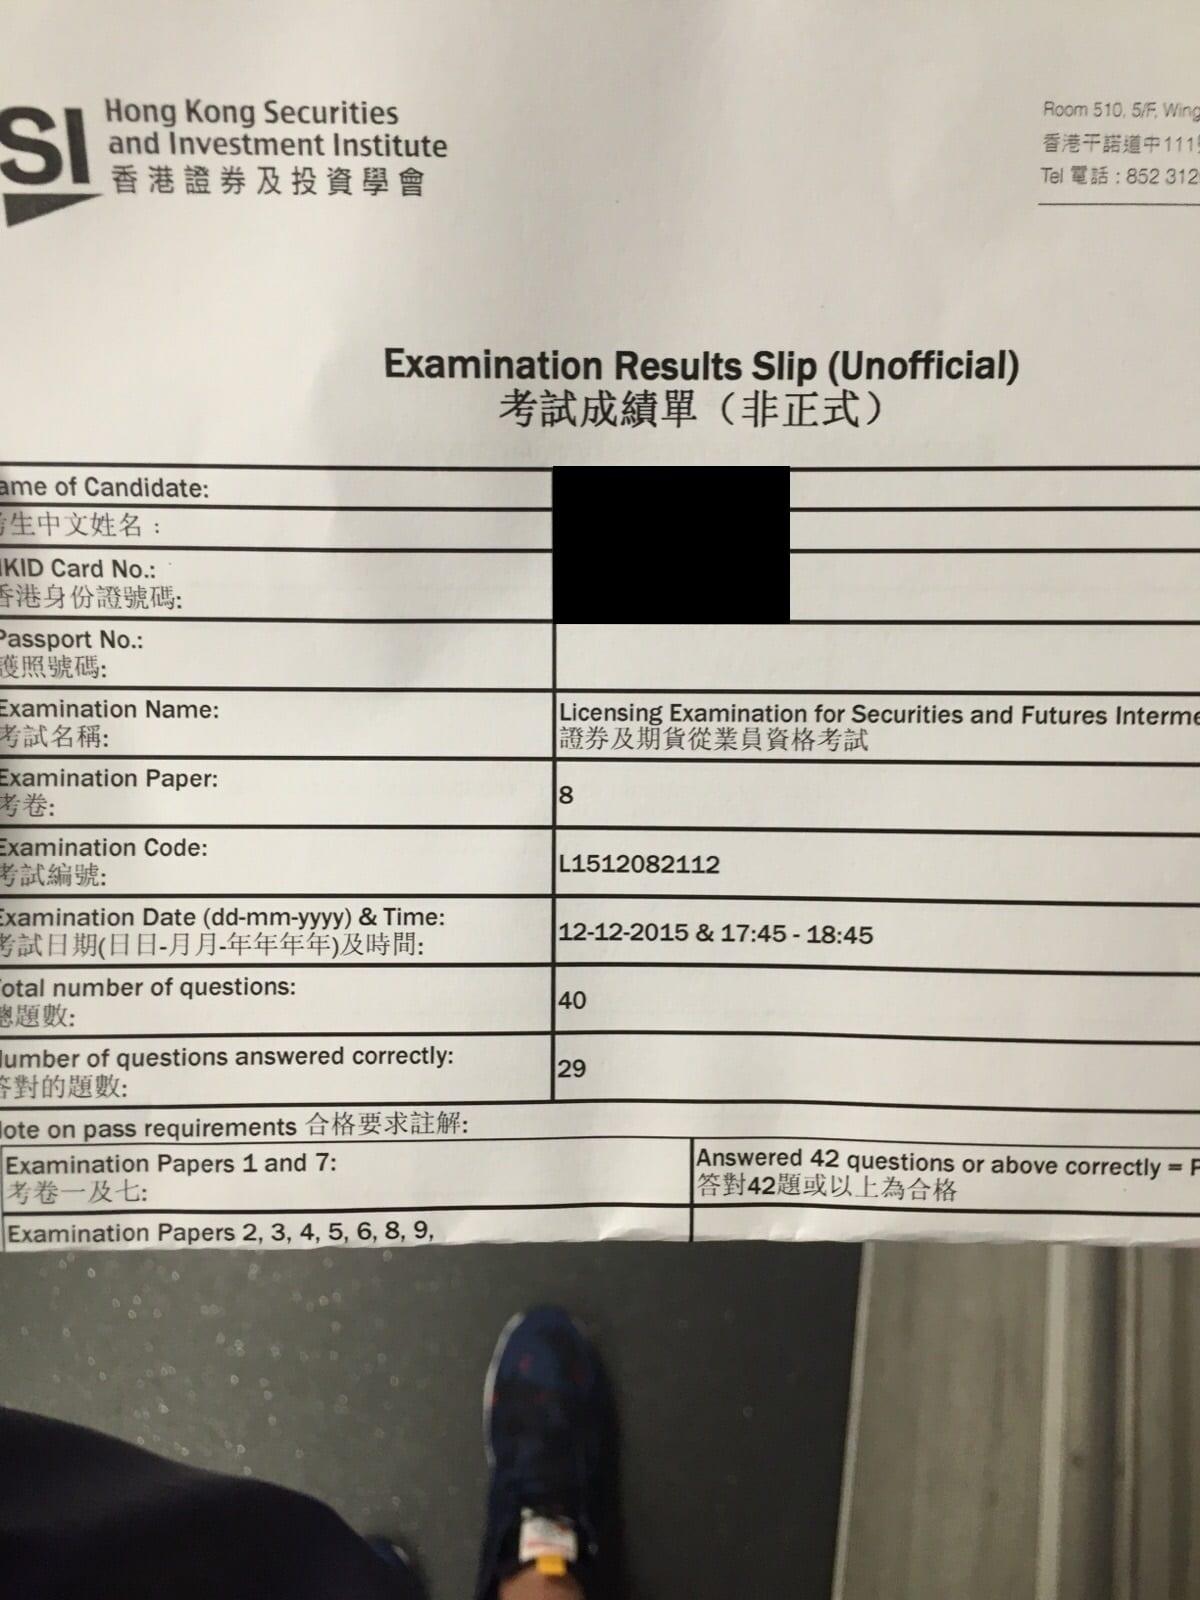 WBYeung 12/12/2015 LE Paper 8 證券期貨從業員資格考試卷八 Pass